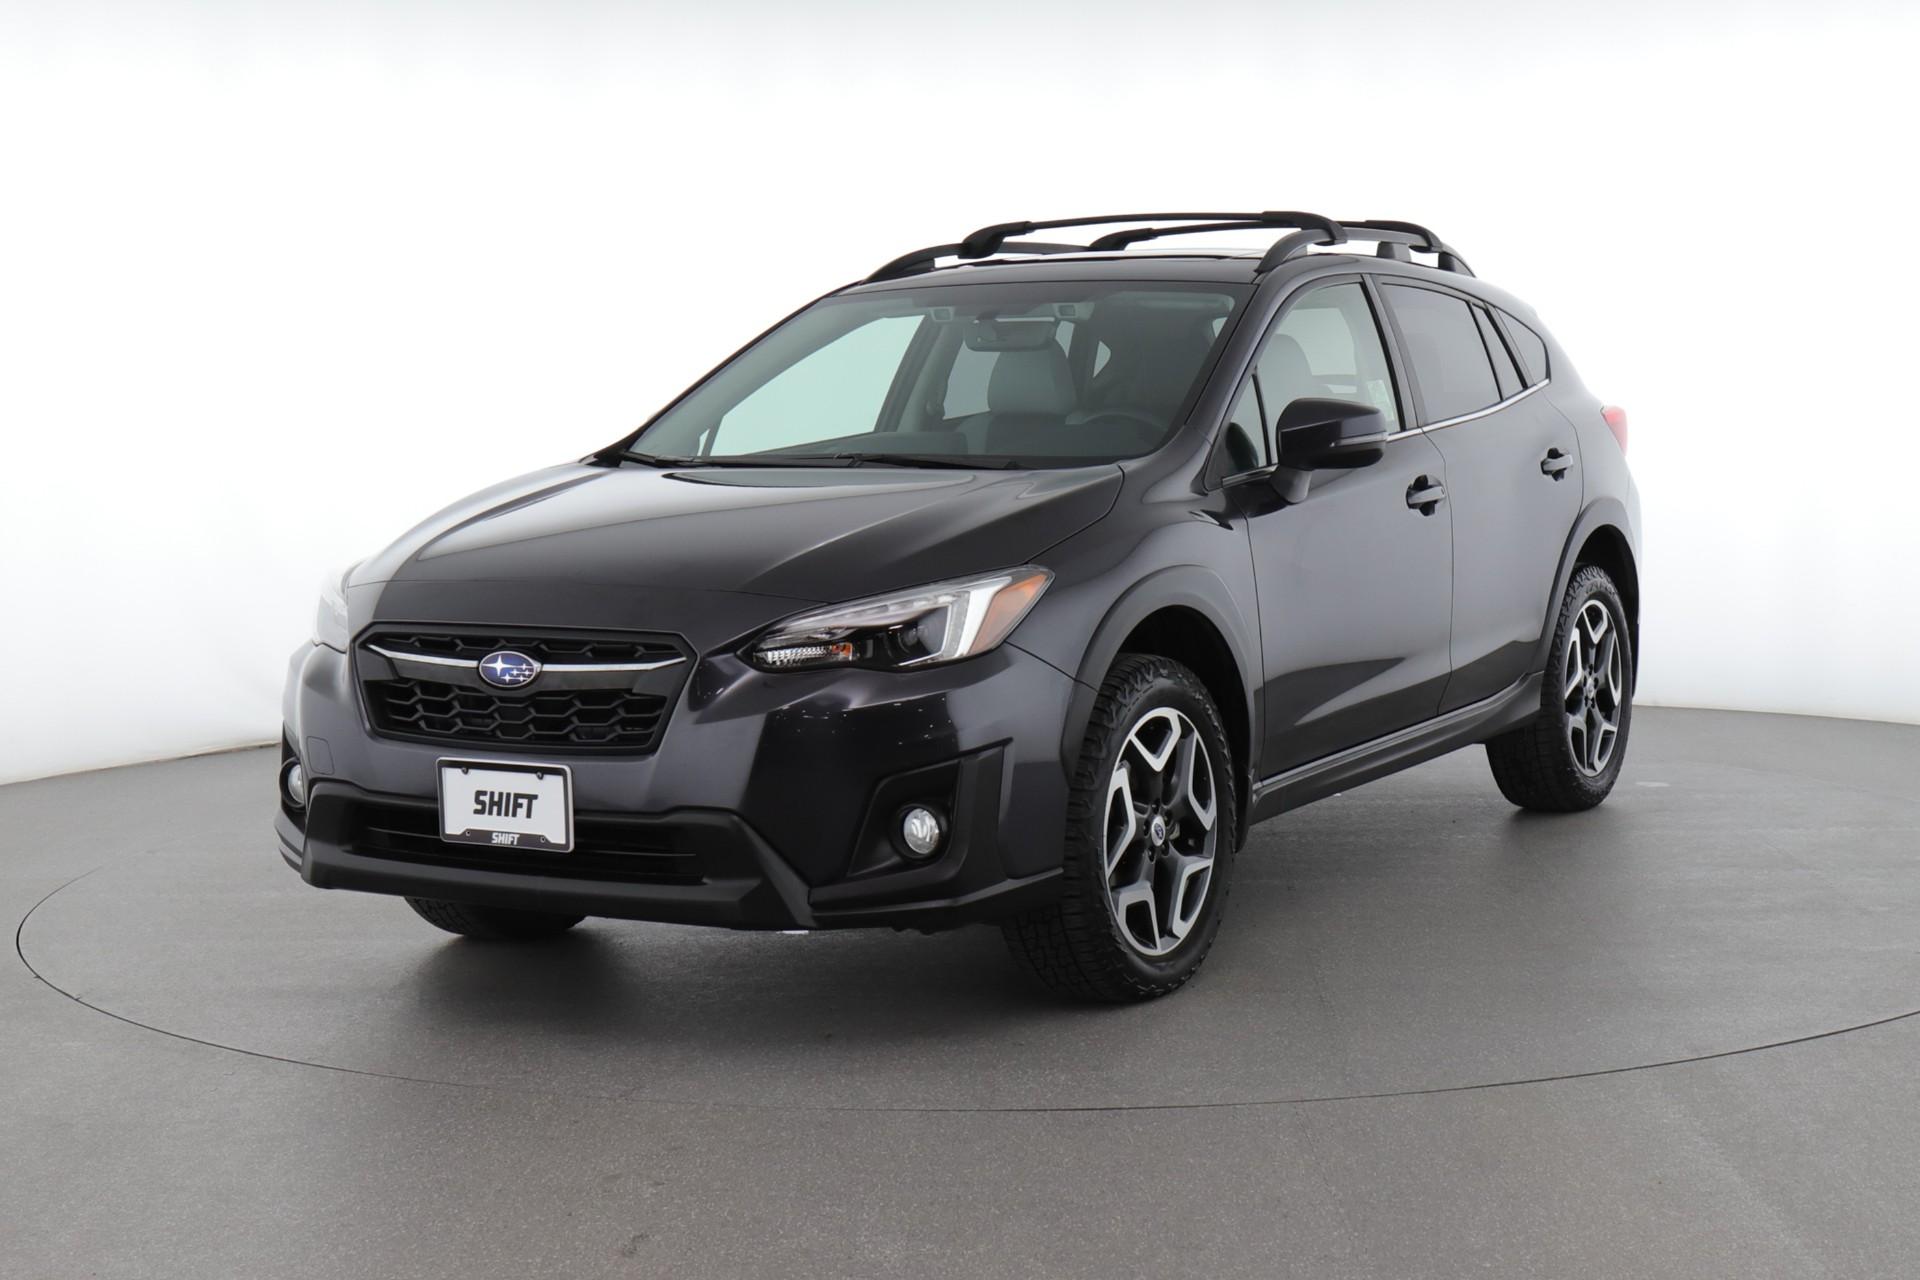 2018 Subaru Crosstrek Limited (from $23,700)